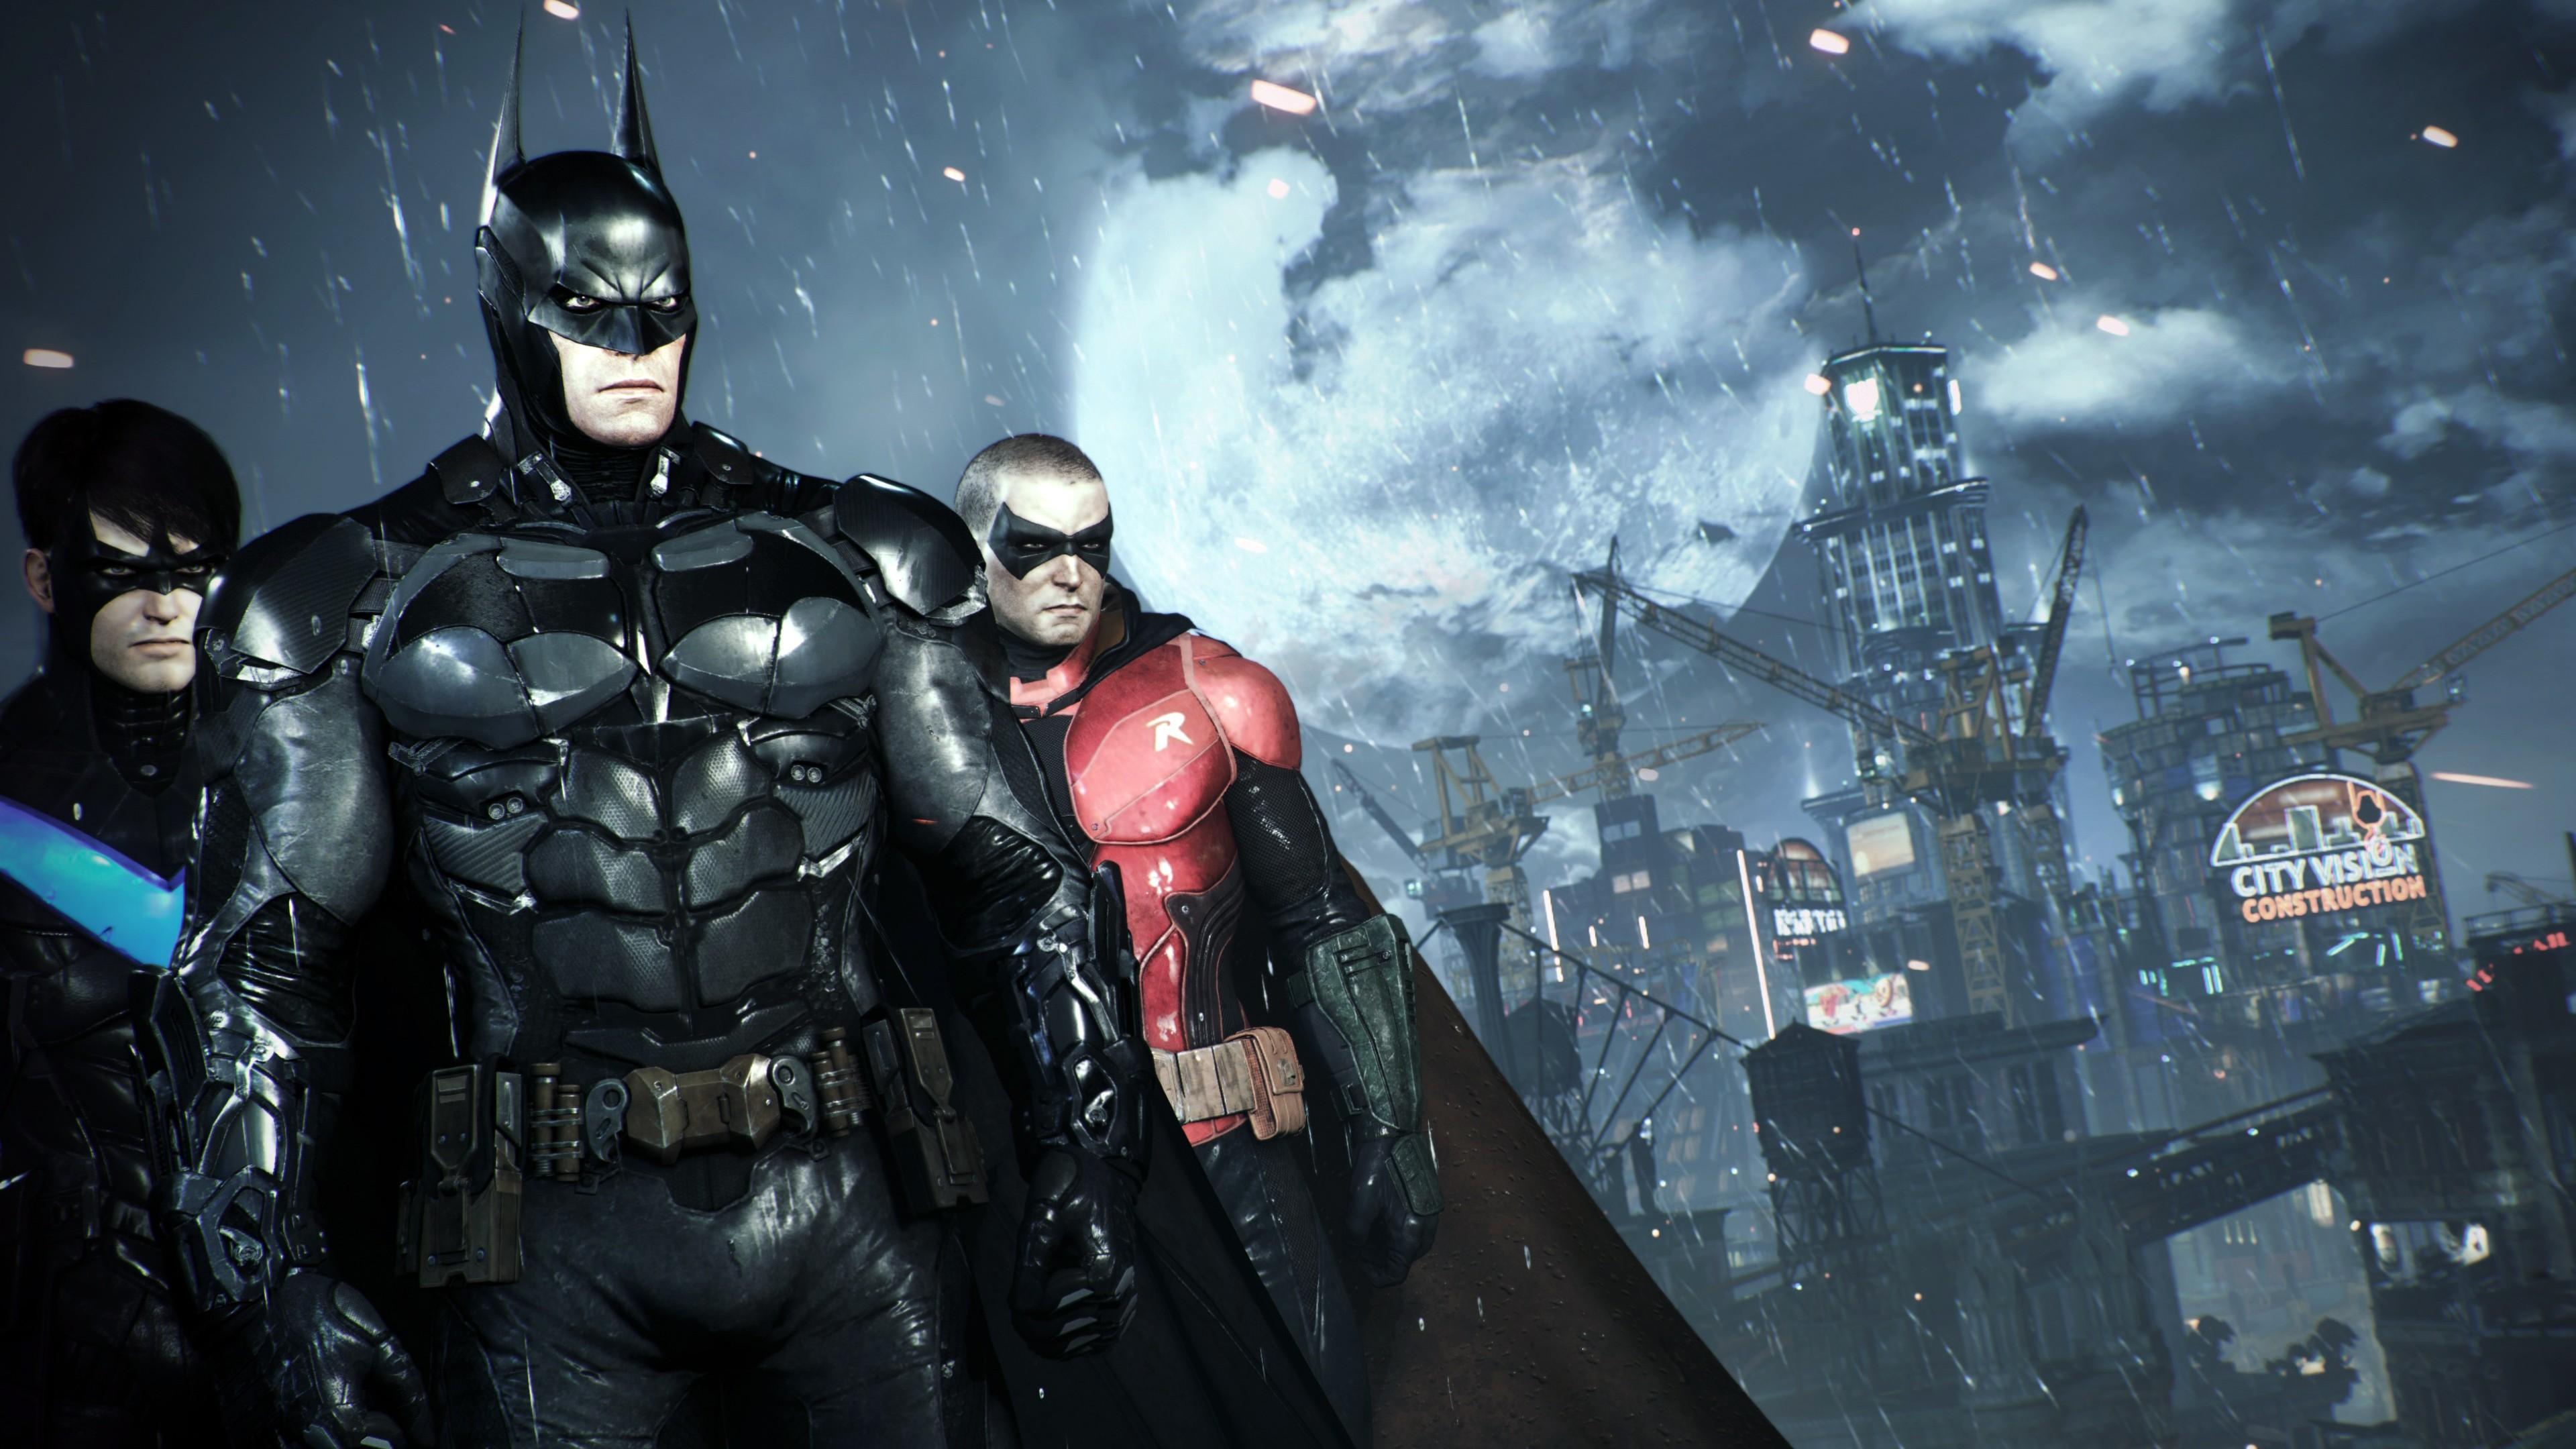 Nightwing Batman Robin in Batman Arkham Knight Wallpaper 4k